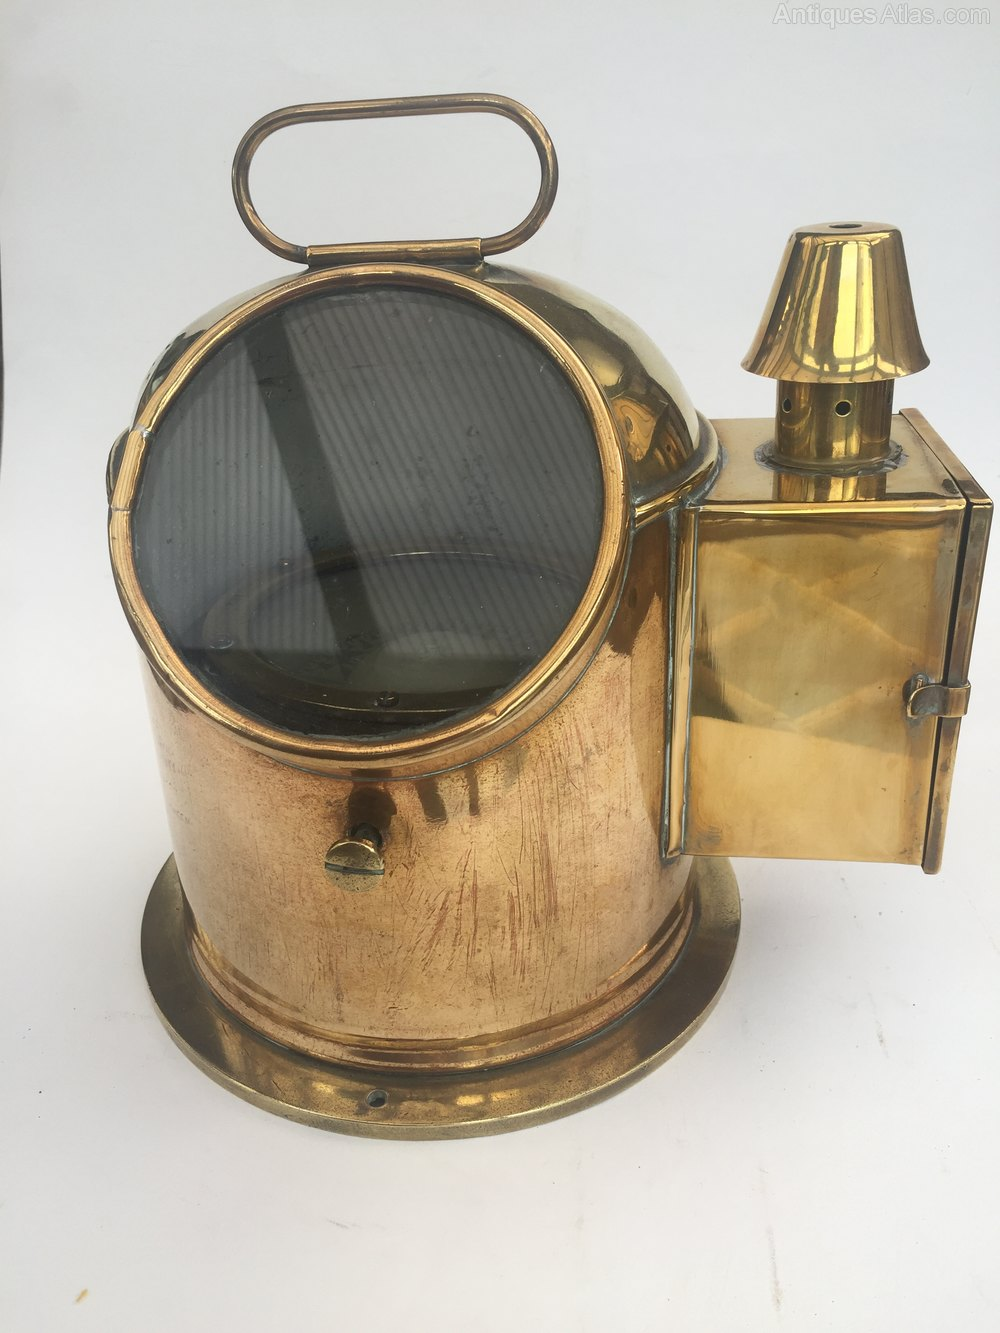 Early brass ships binnacle compass